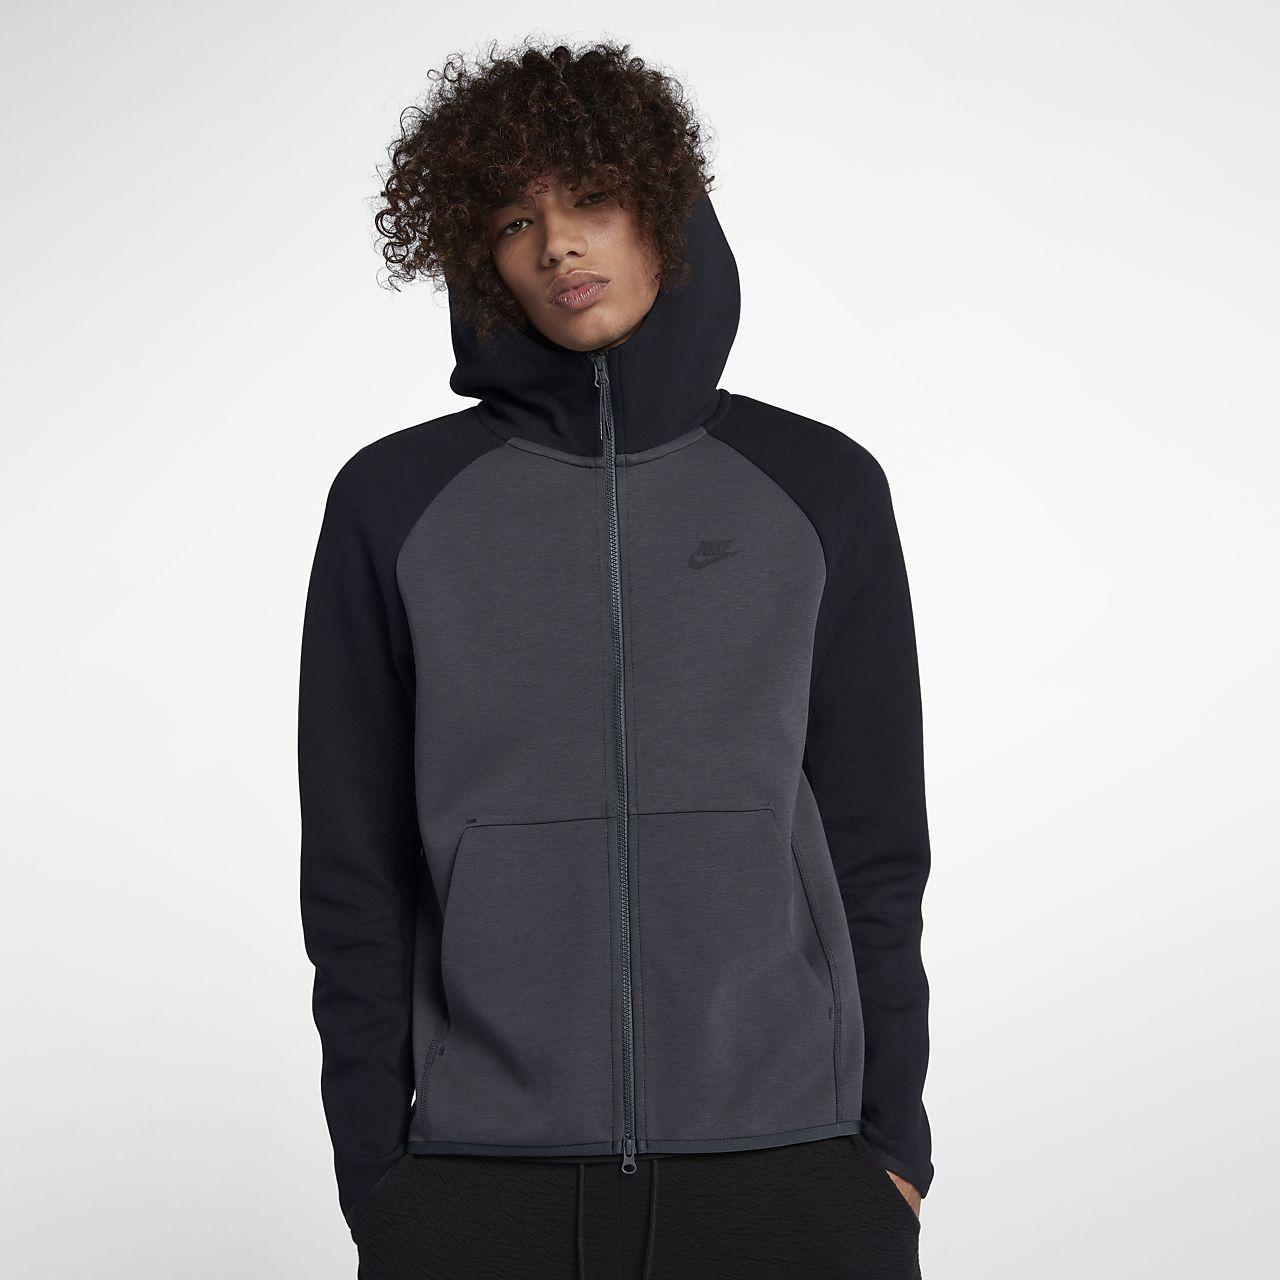 63369fd7b1 ... Nike Sportswear Tech Fleece hosszú cipzáras férfi kapucnis pulóver